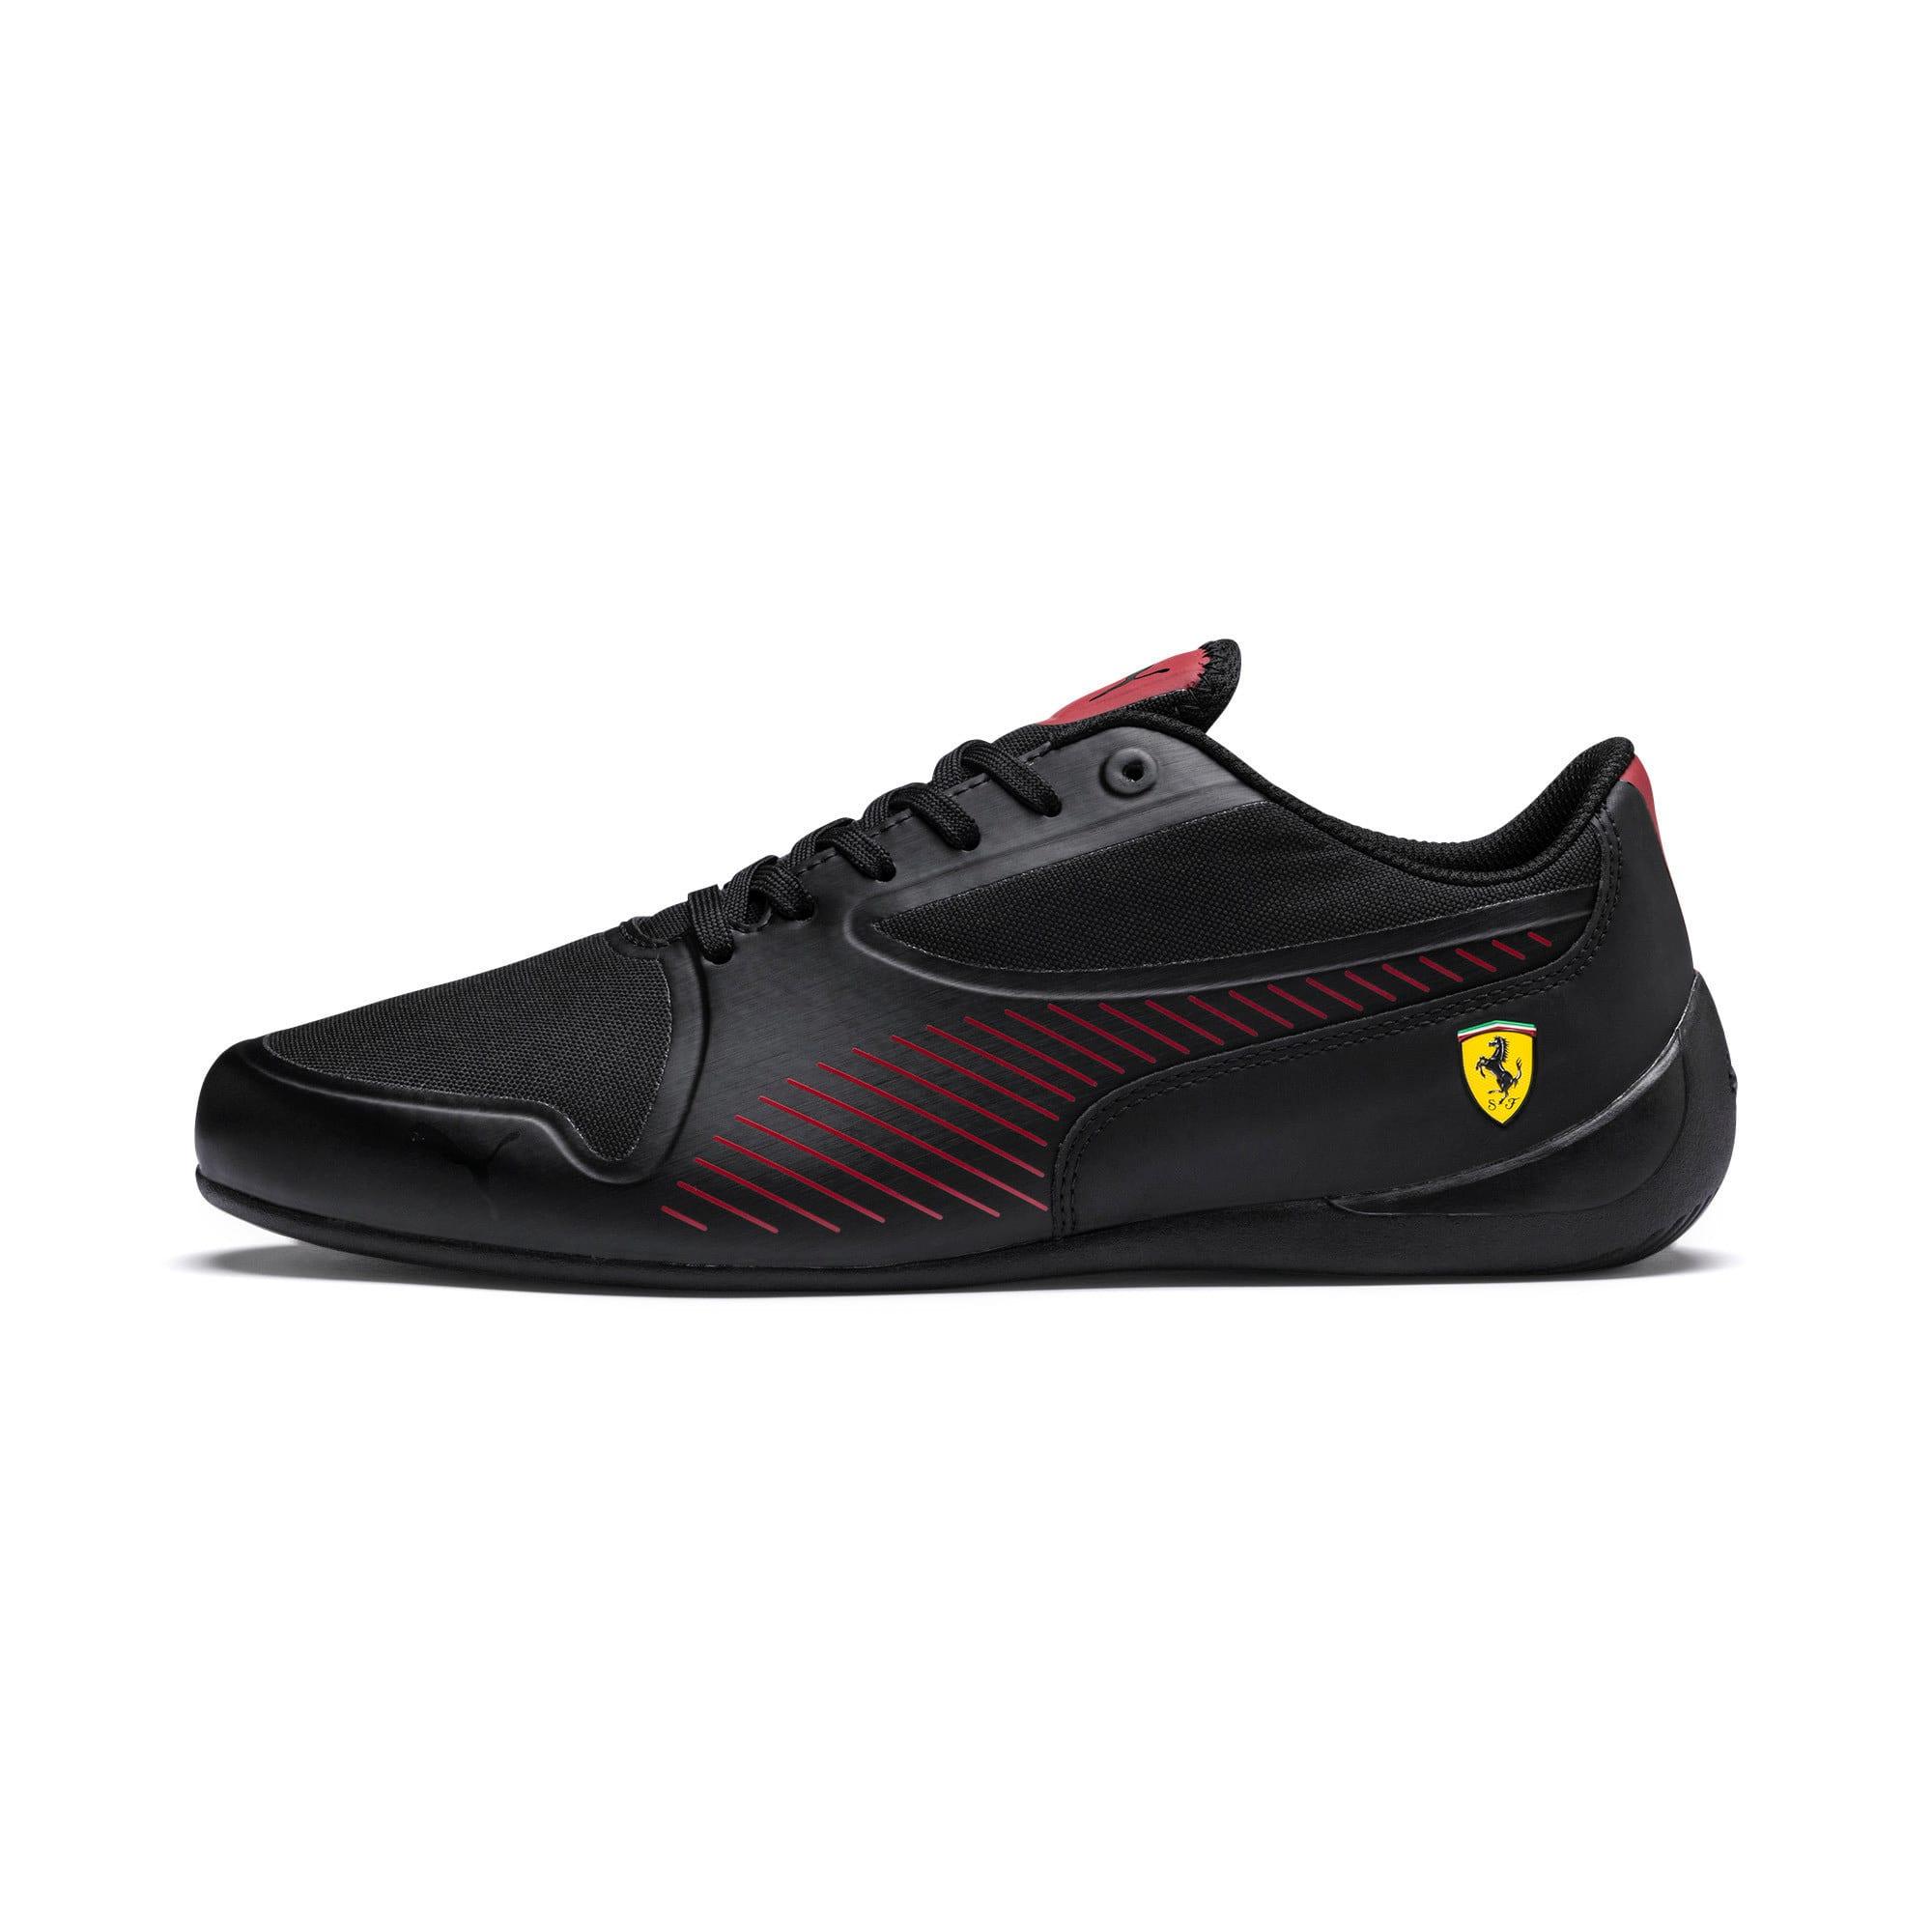 Thumbnail 1 of Ferrari Drift Cat 7 Ultra Trainers, Puma Black-Rosso Corsa, medium-IND